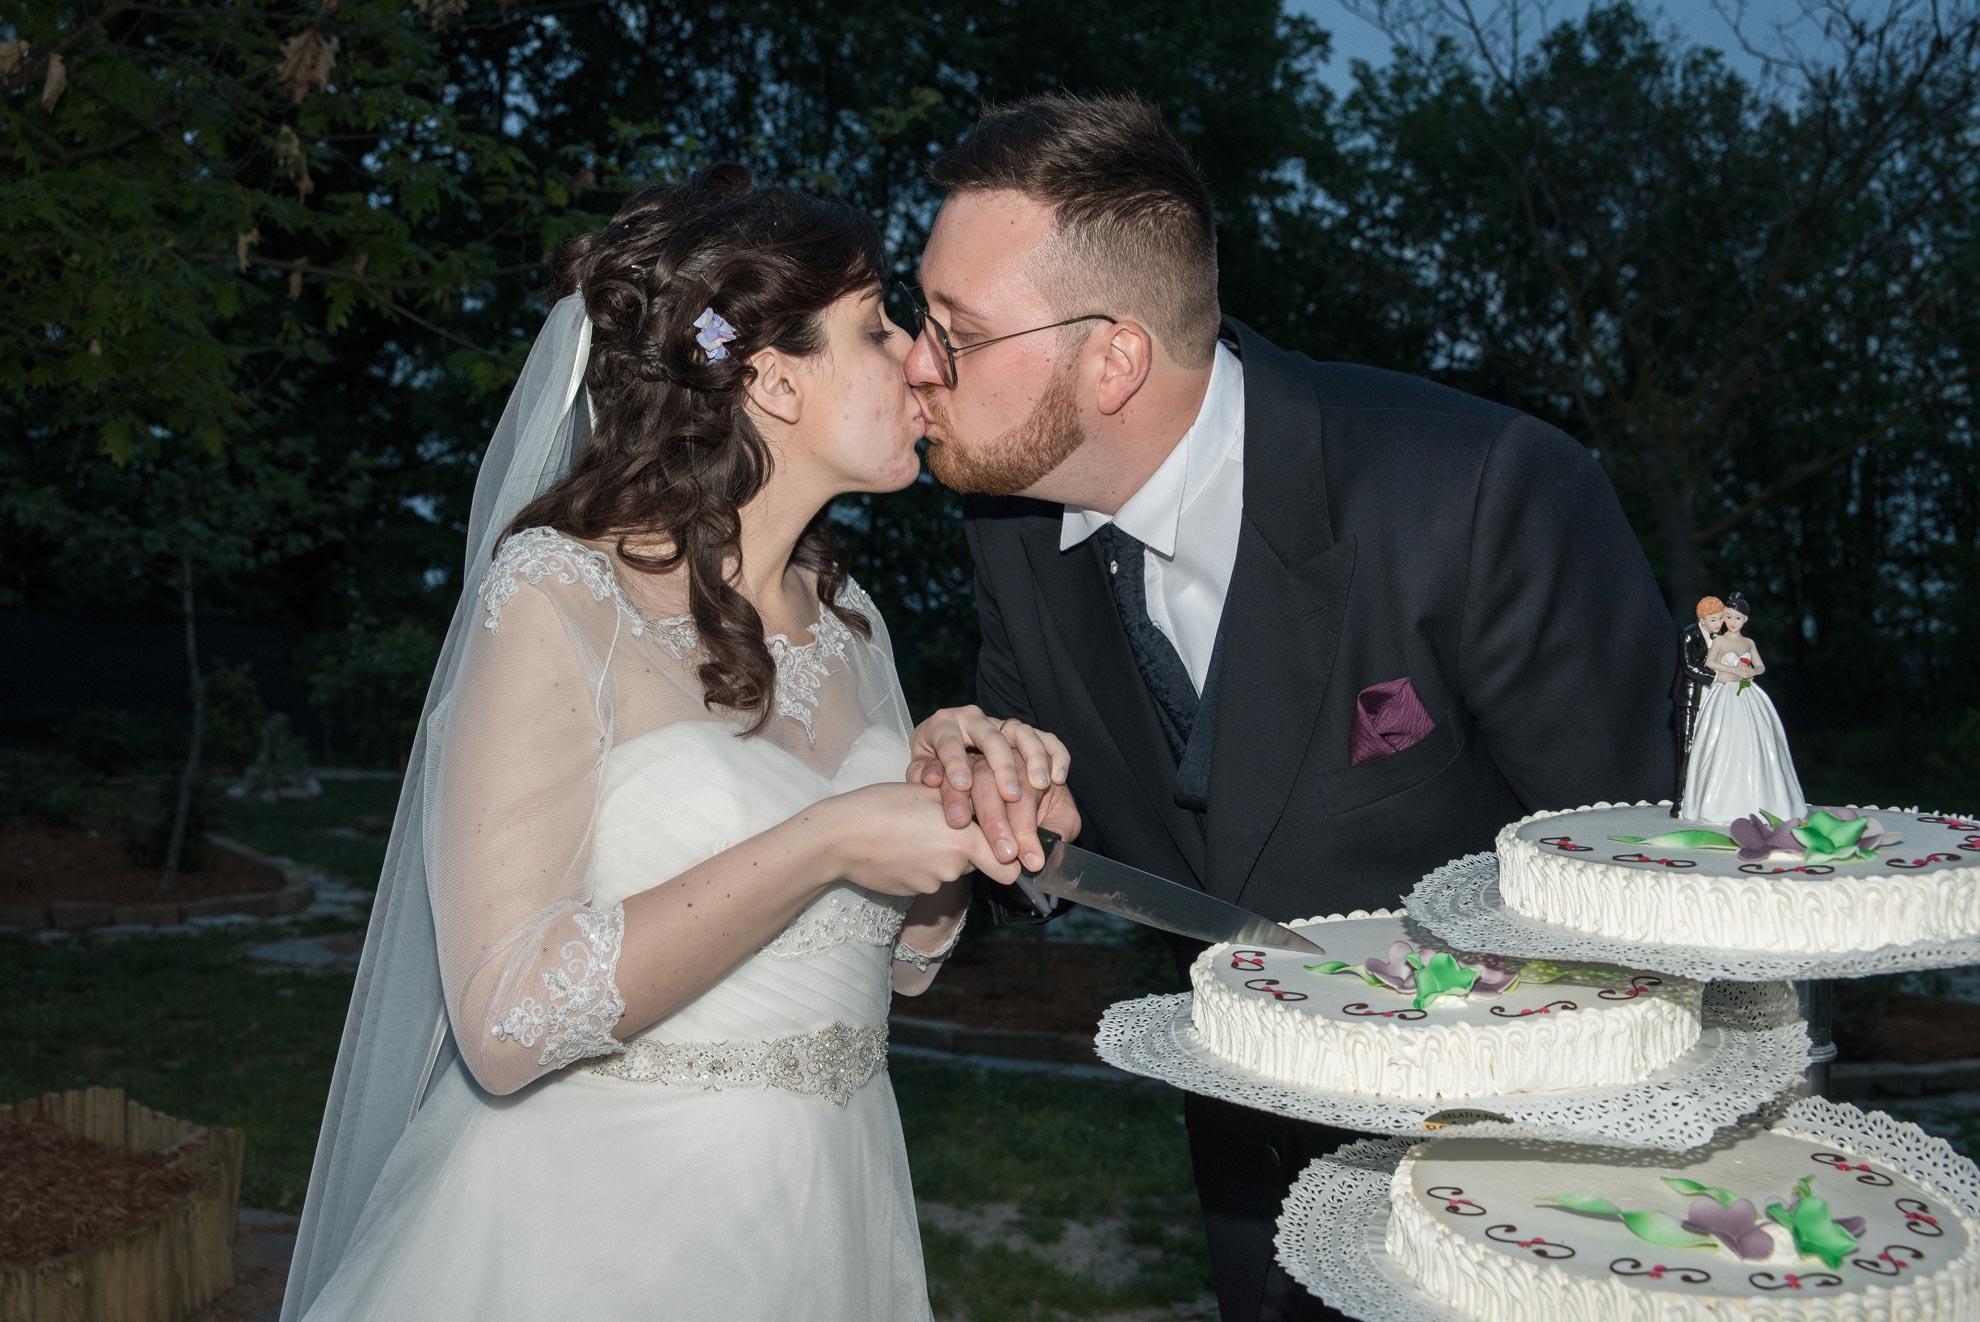 Matrimonio a Narzole Lorenza Diego - DSC 3422 - Fotografie matrimonio taglio della torta - Fotografie matrimonio taglio della torta